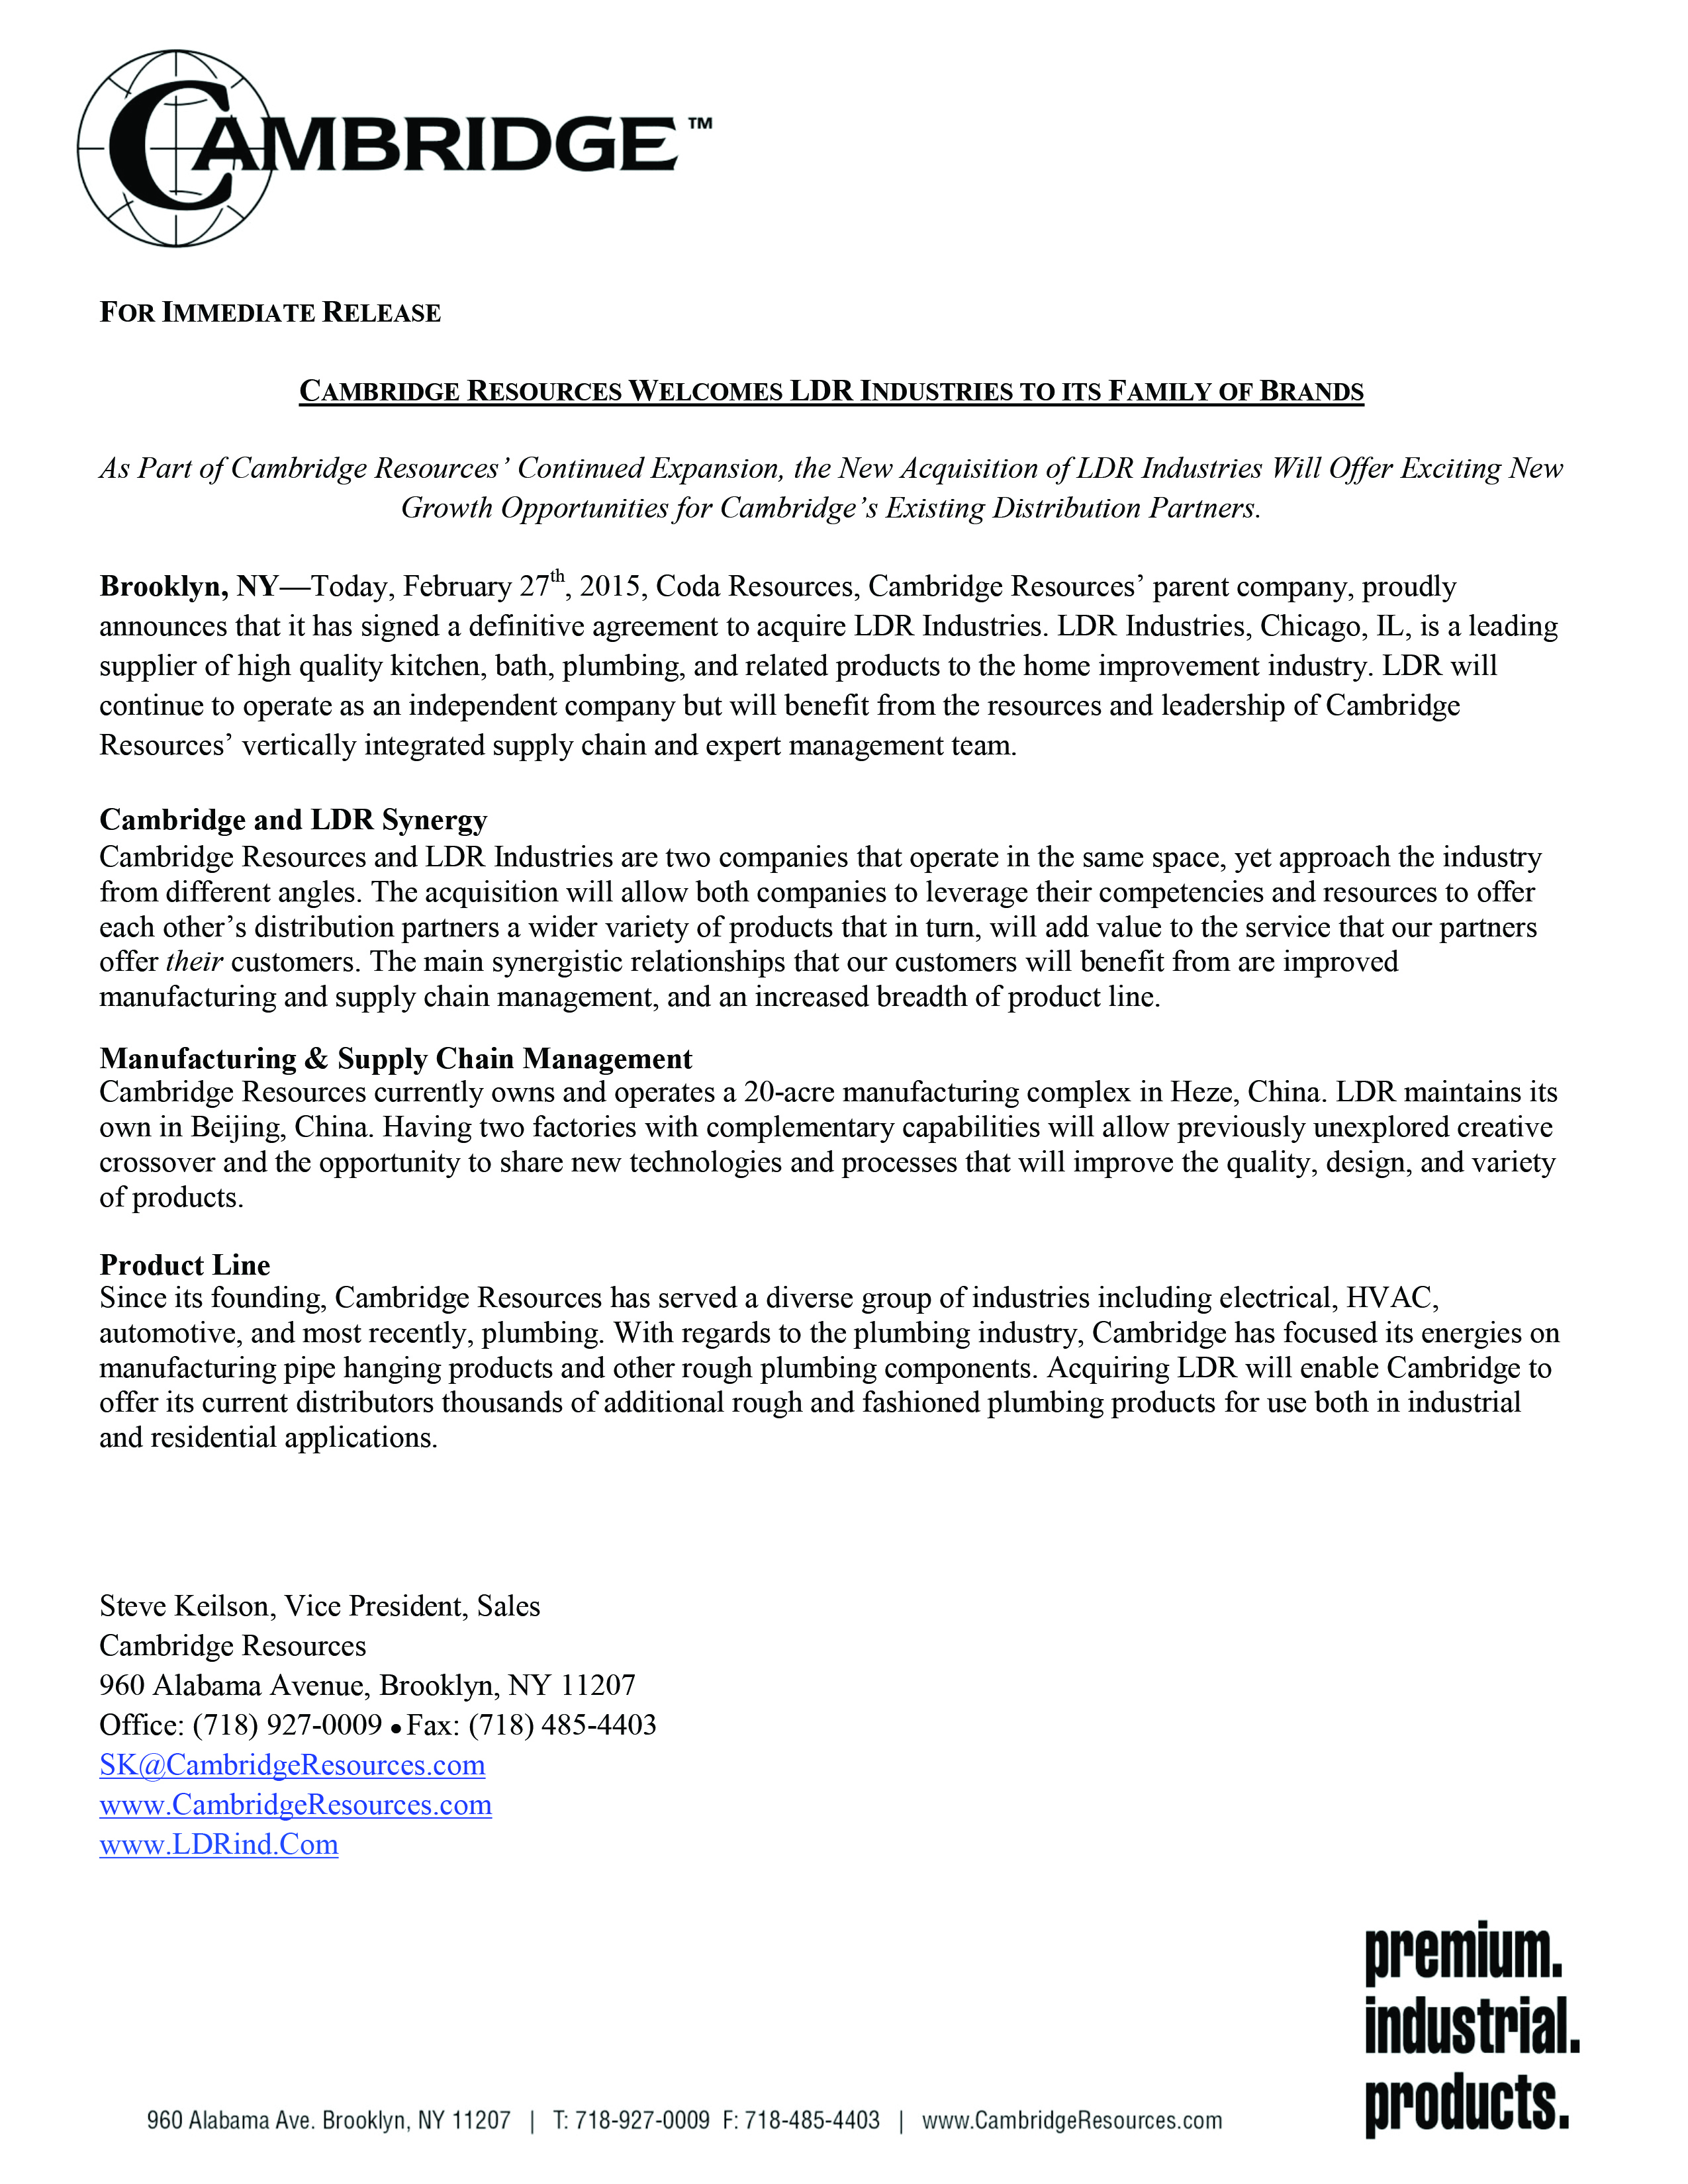 LDR Cambridge Press Release